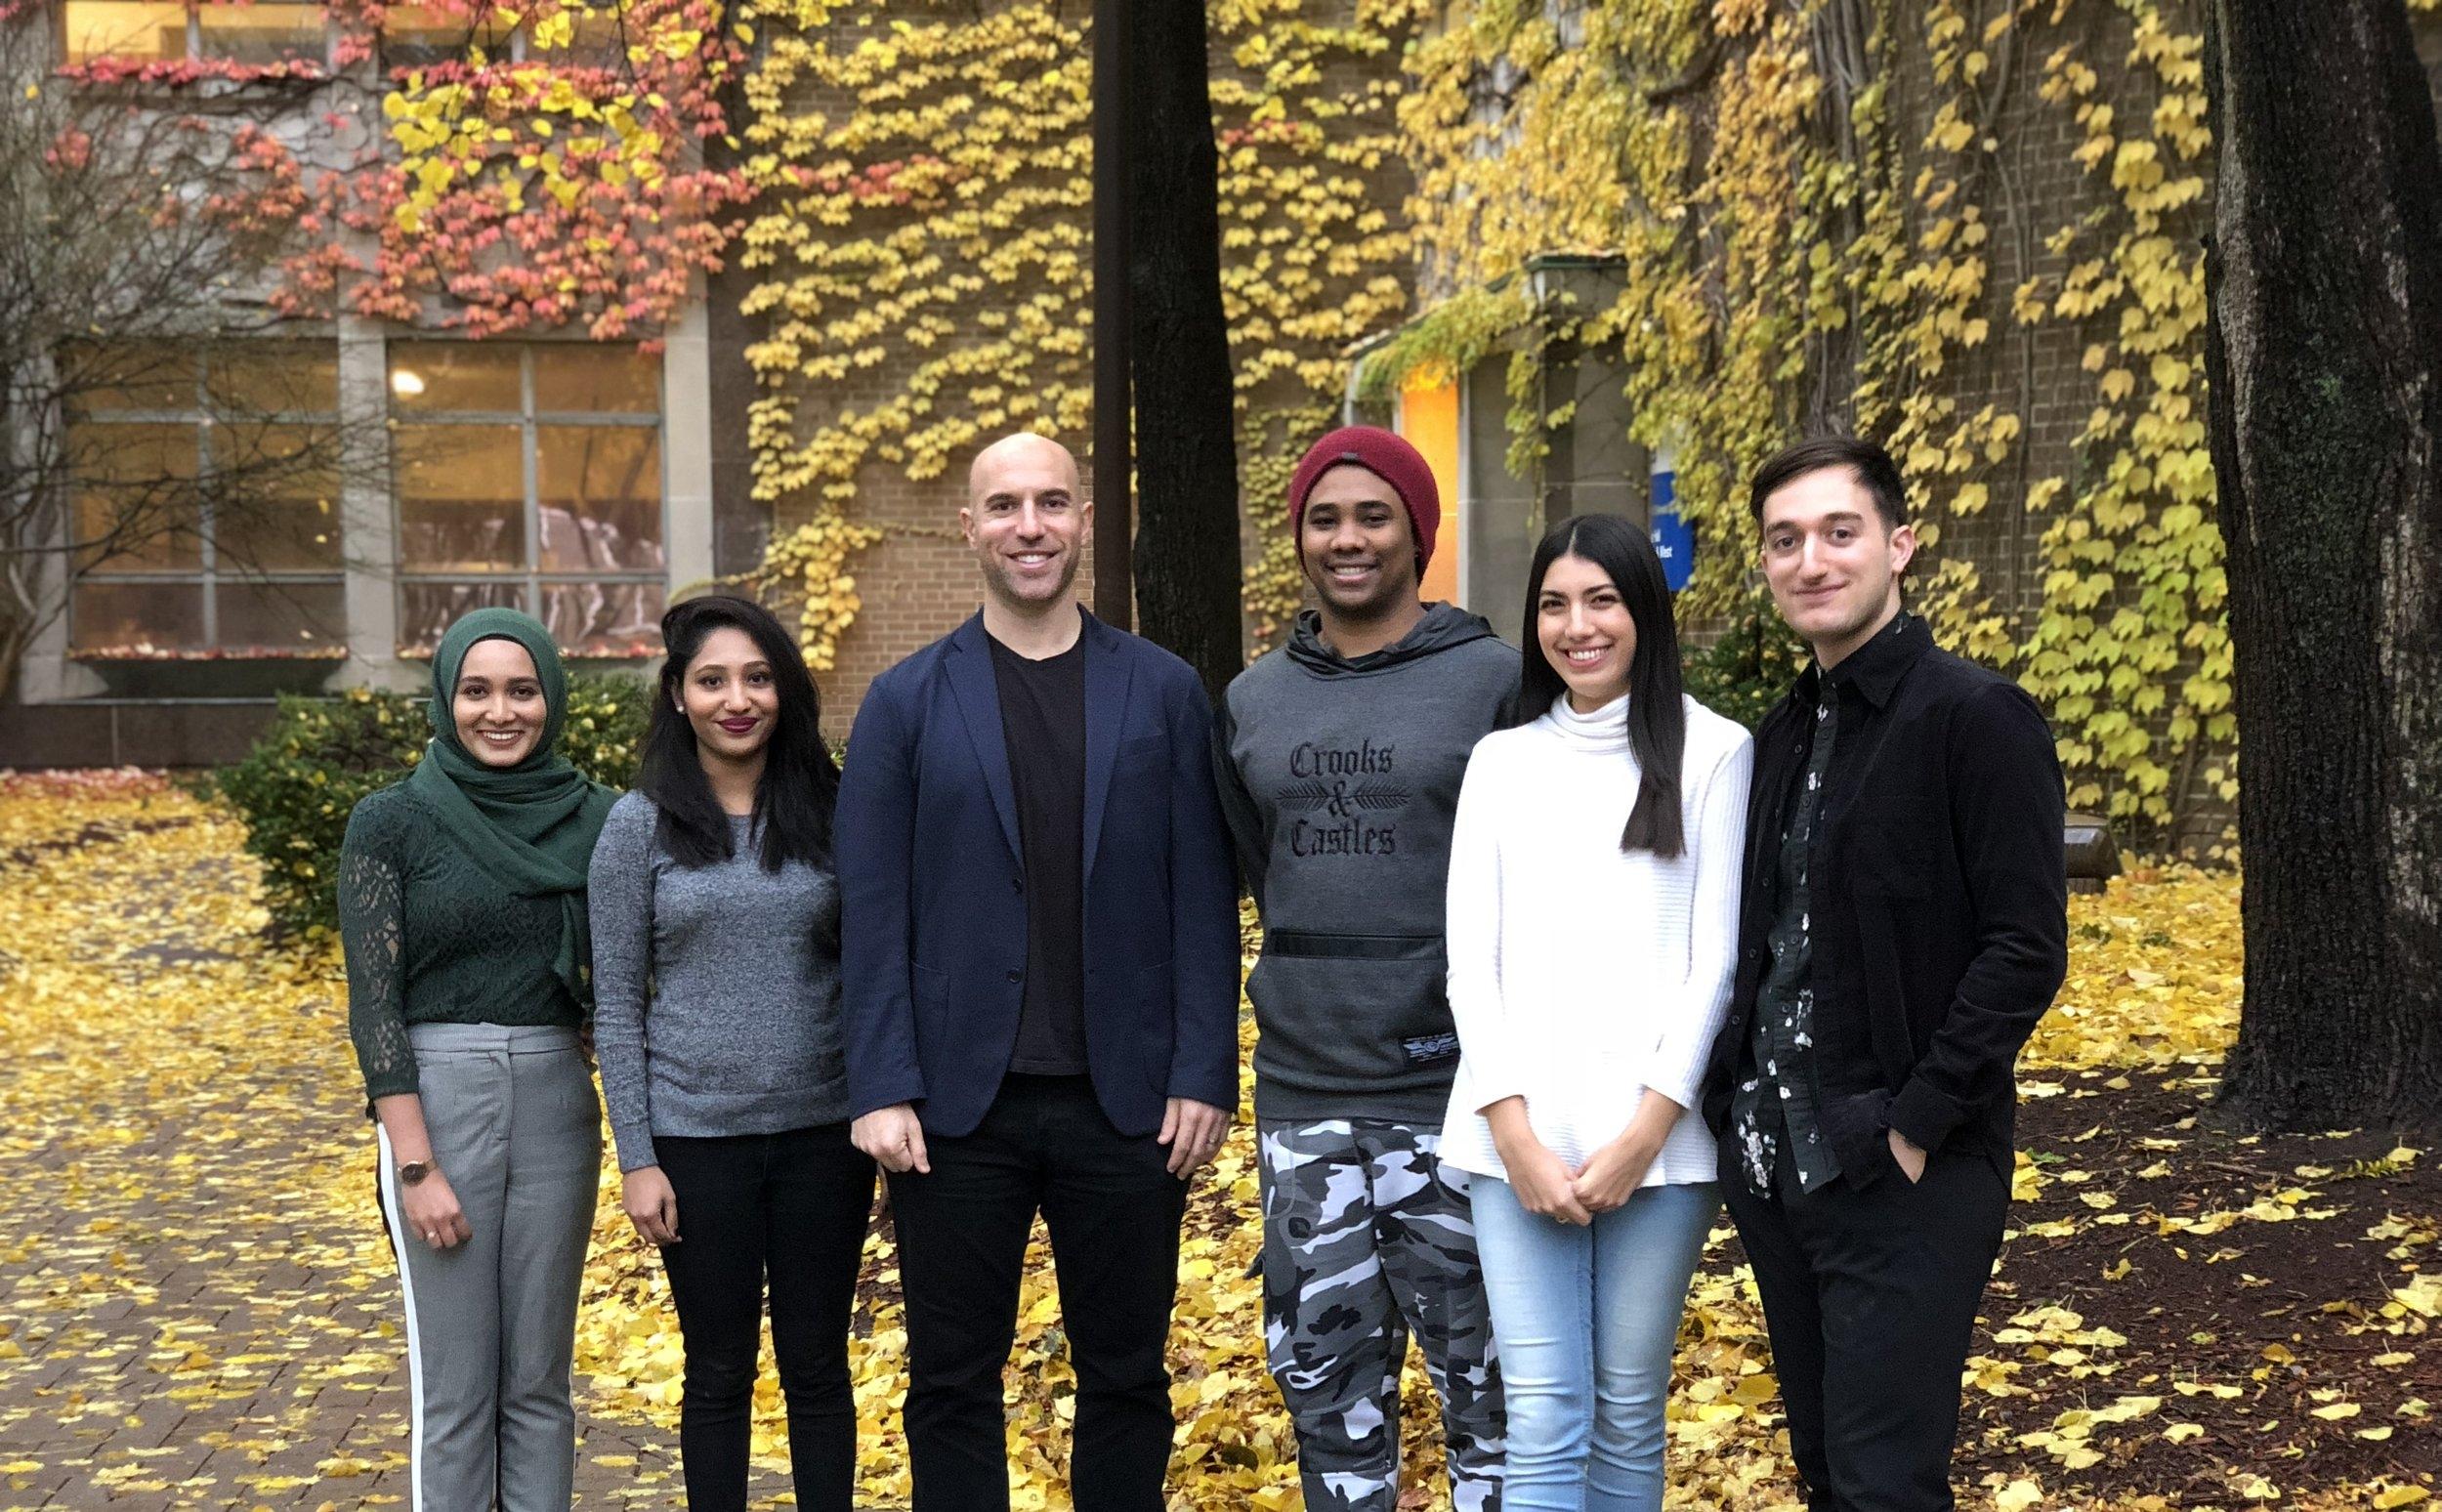 Fall 2018   L to R - Zainab Shakeel, Jyotsna Mary George, MJA, Taj Seaton, Julia Pia, Nick Jamkhou